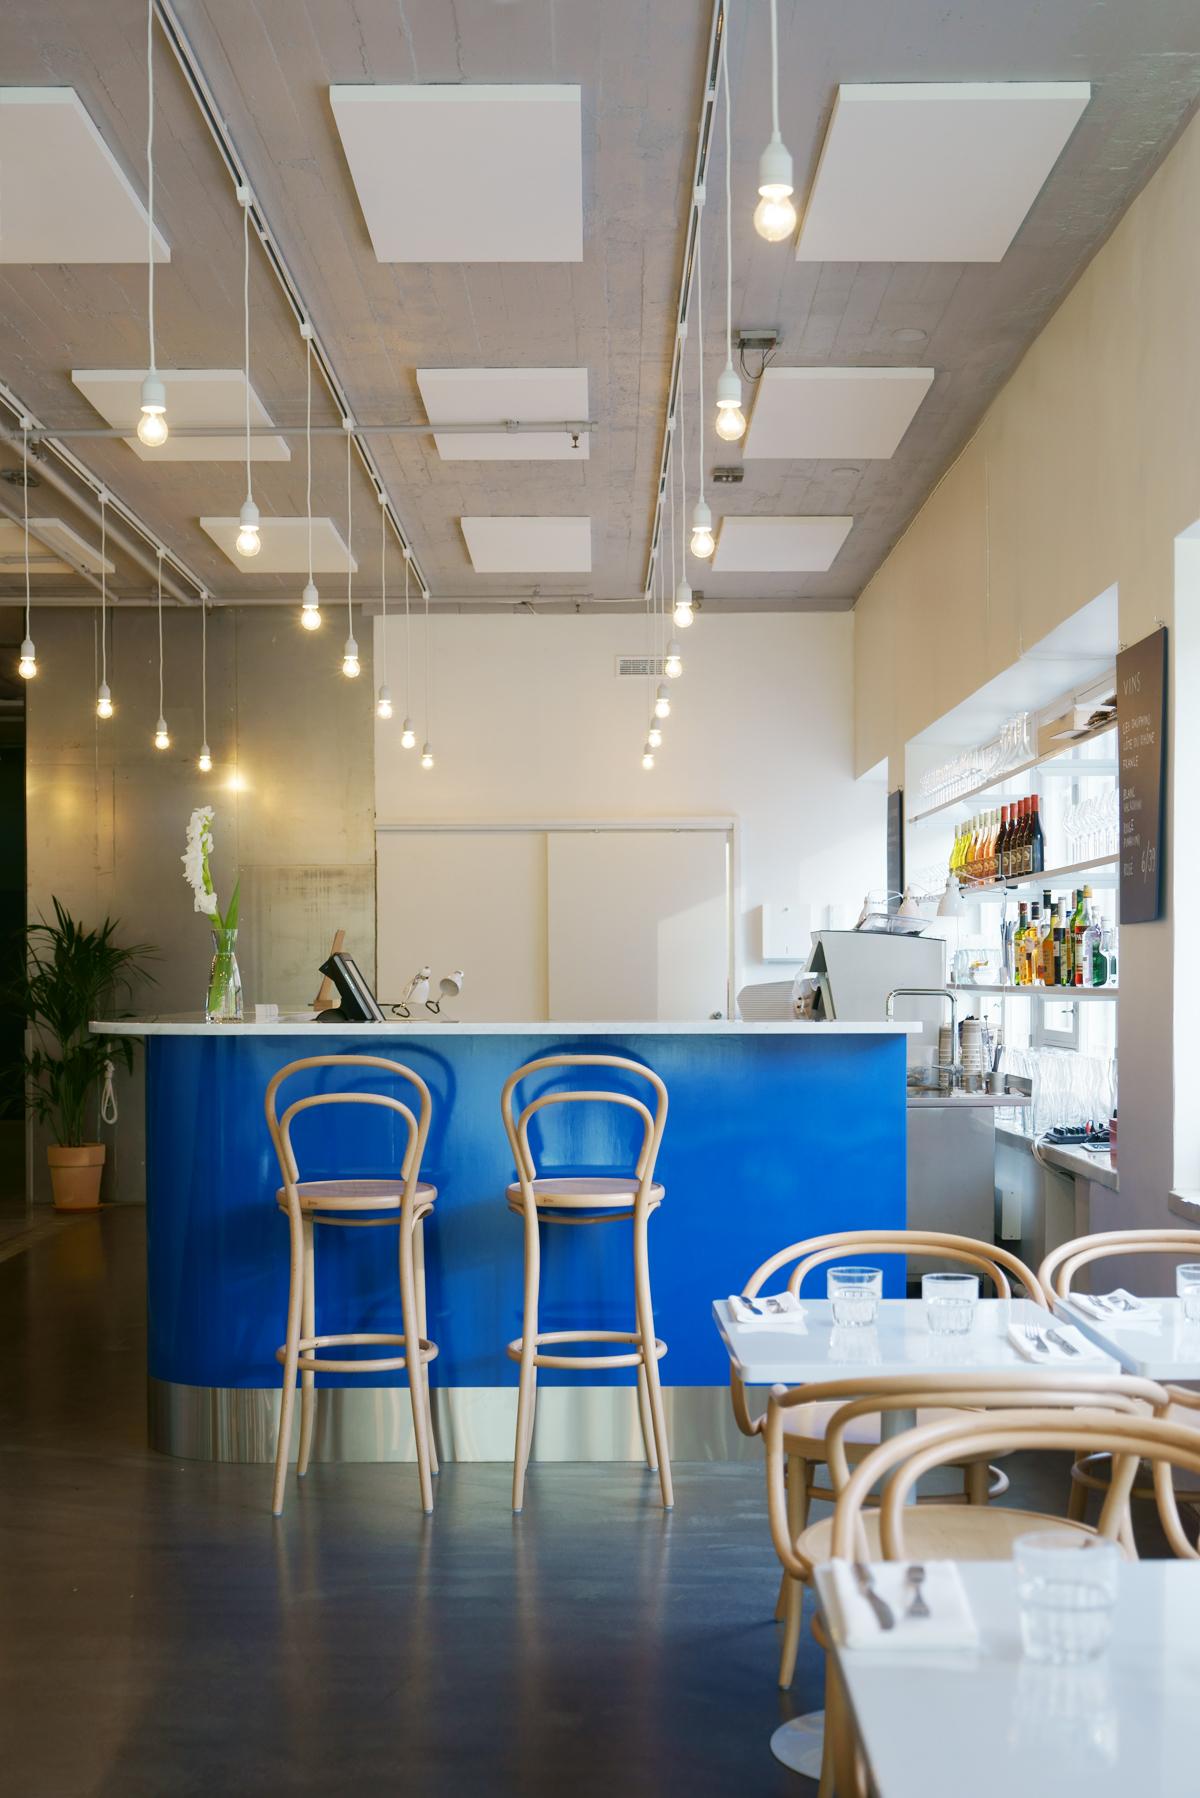 lumi re vin cuisine mattila merz. Black Bedroom Furniture Sets. Home Design Ideas